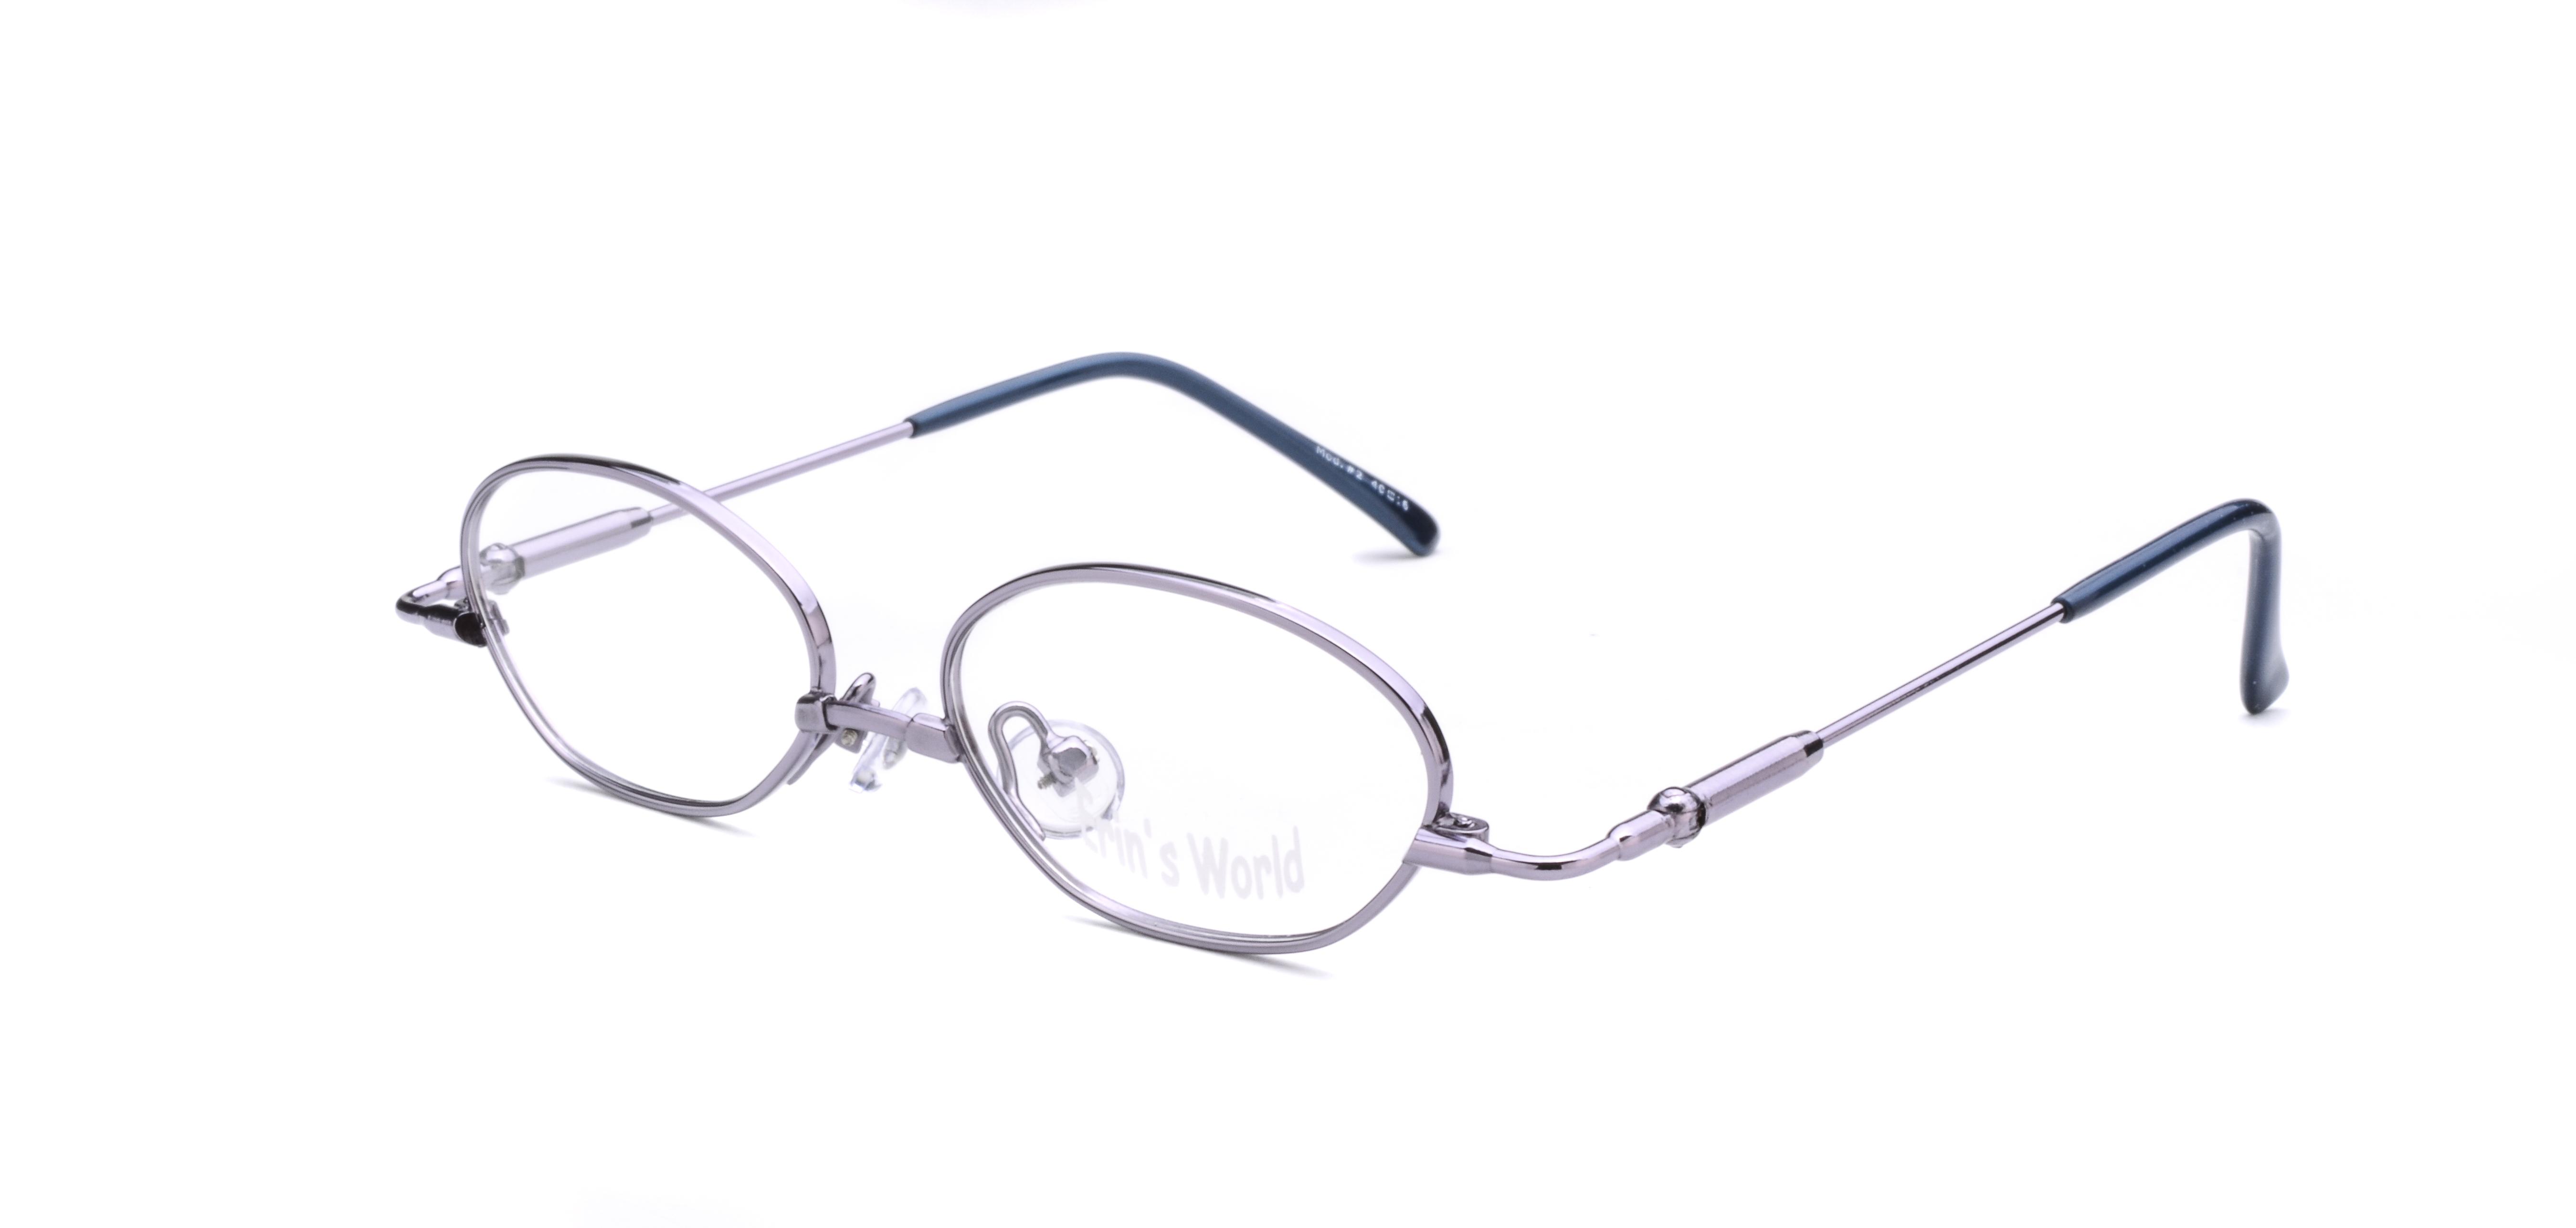 30f32c7844d Low Nose Bridge Glasses for Kids - Optiwow